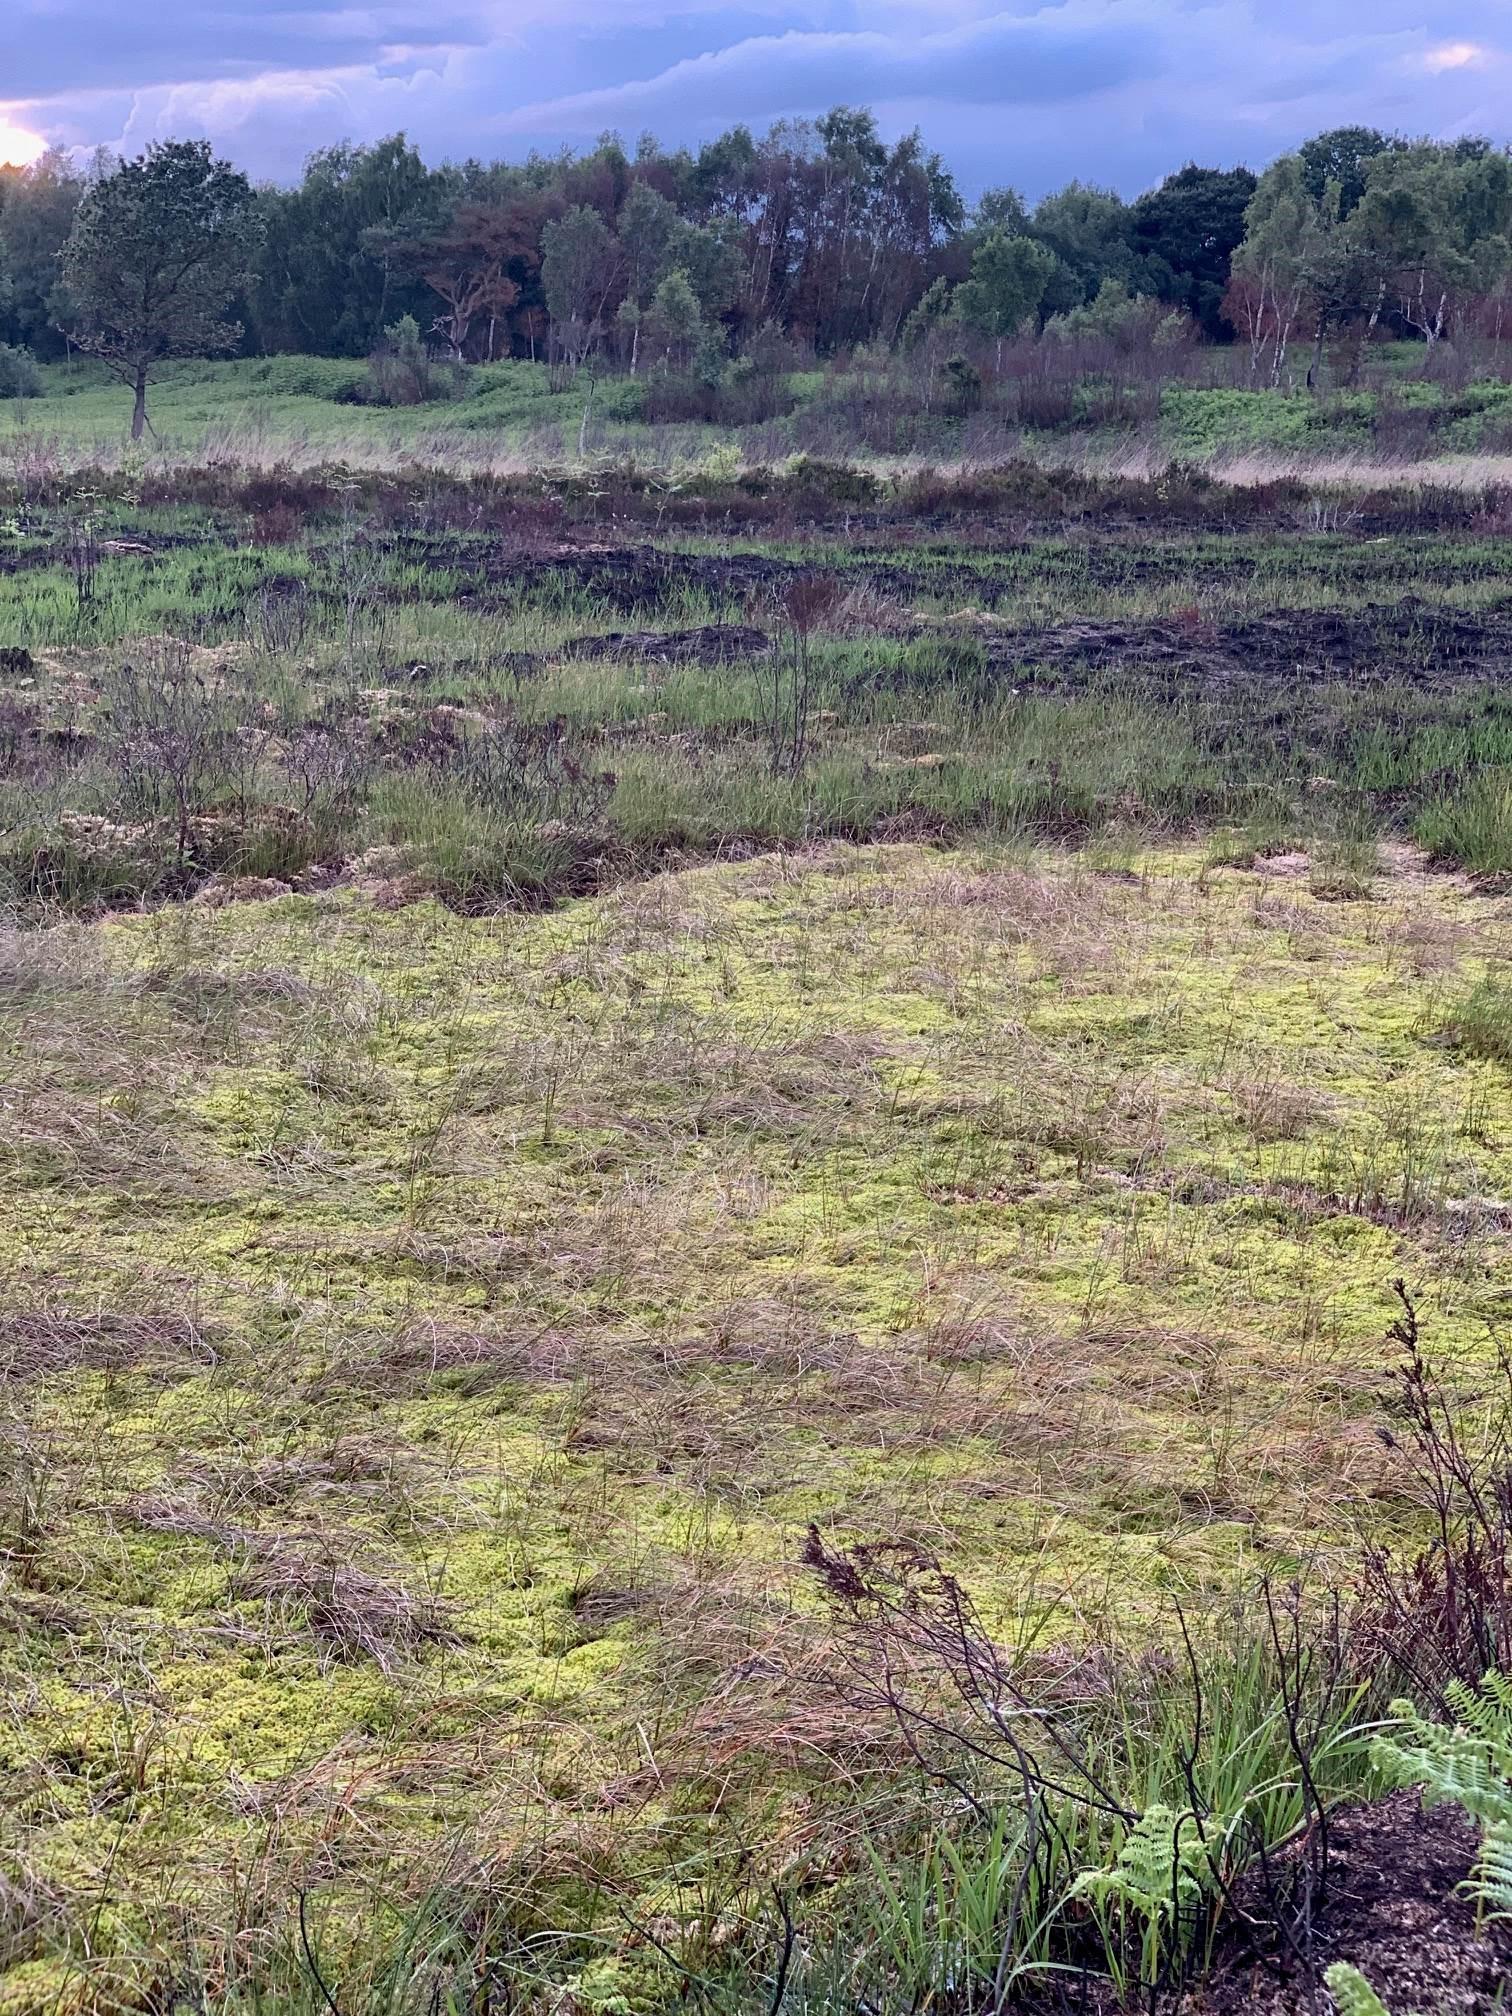 Lough Neagh Landscape Partnership Moss Blog – June 25th 2019